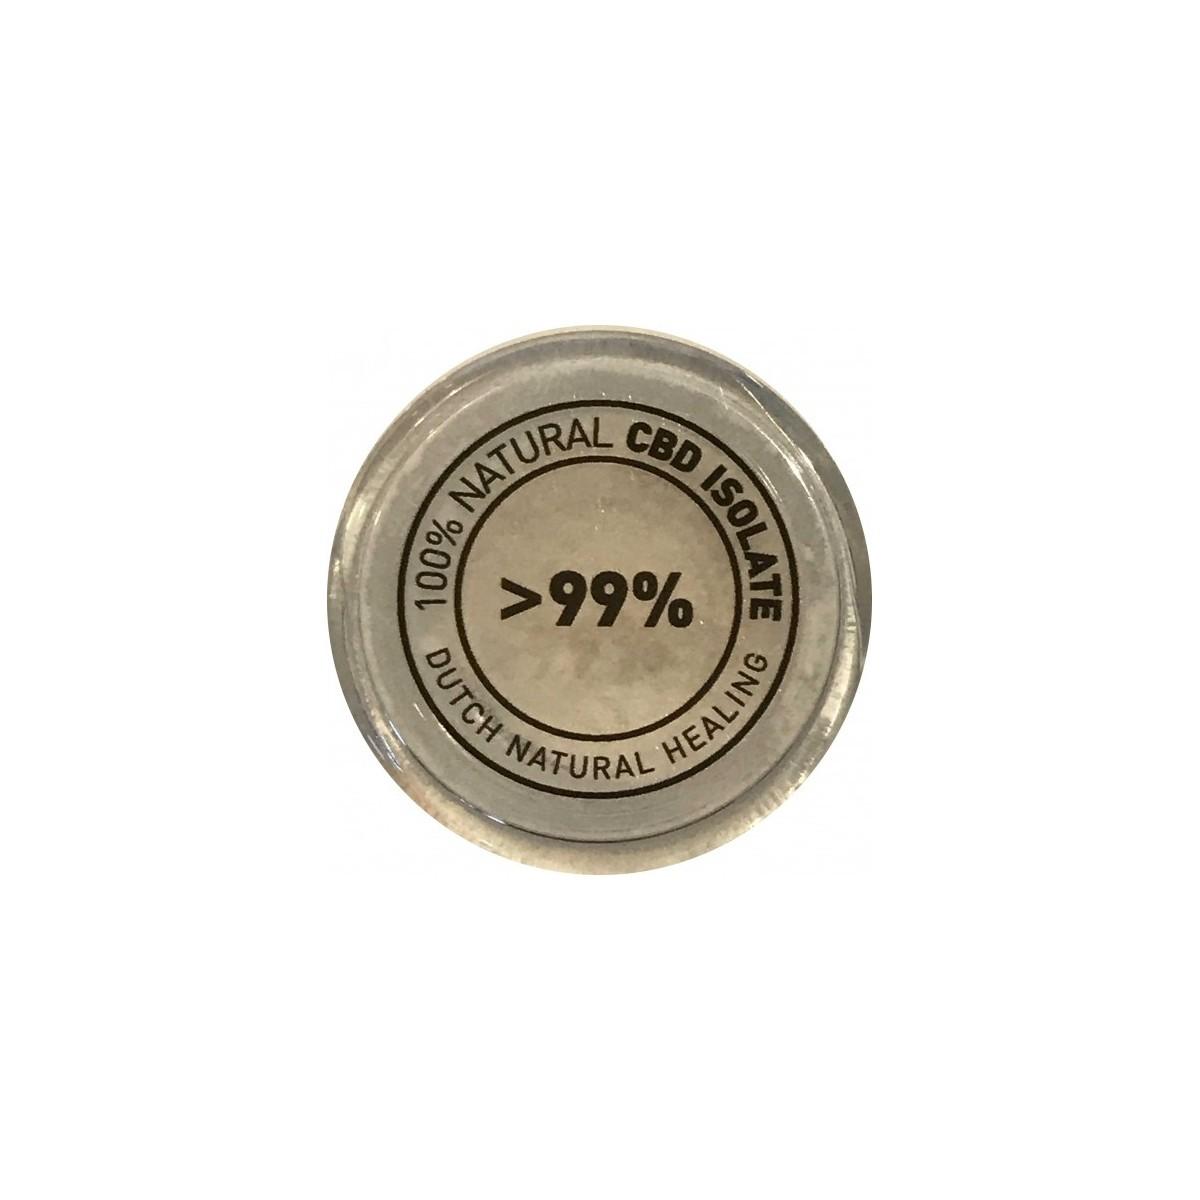 Cristaux CBD pur 99.9% 1Gr Dutch Natural Healing - 2